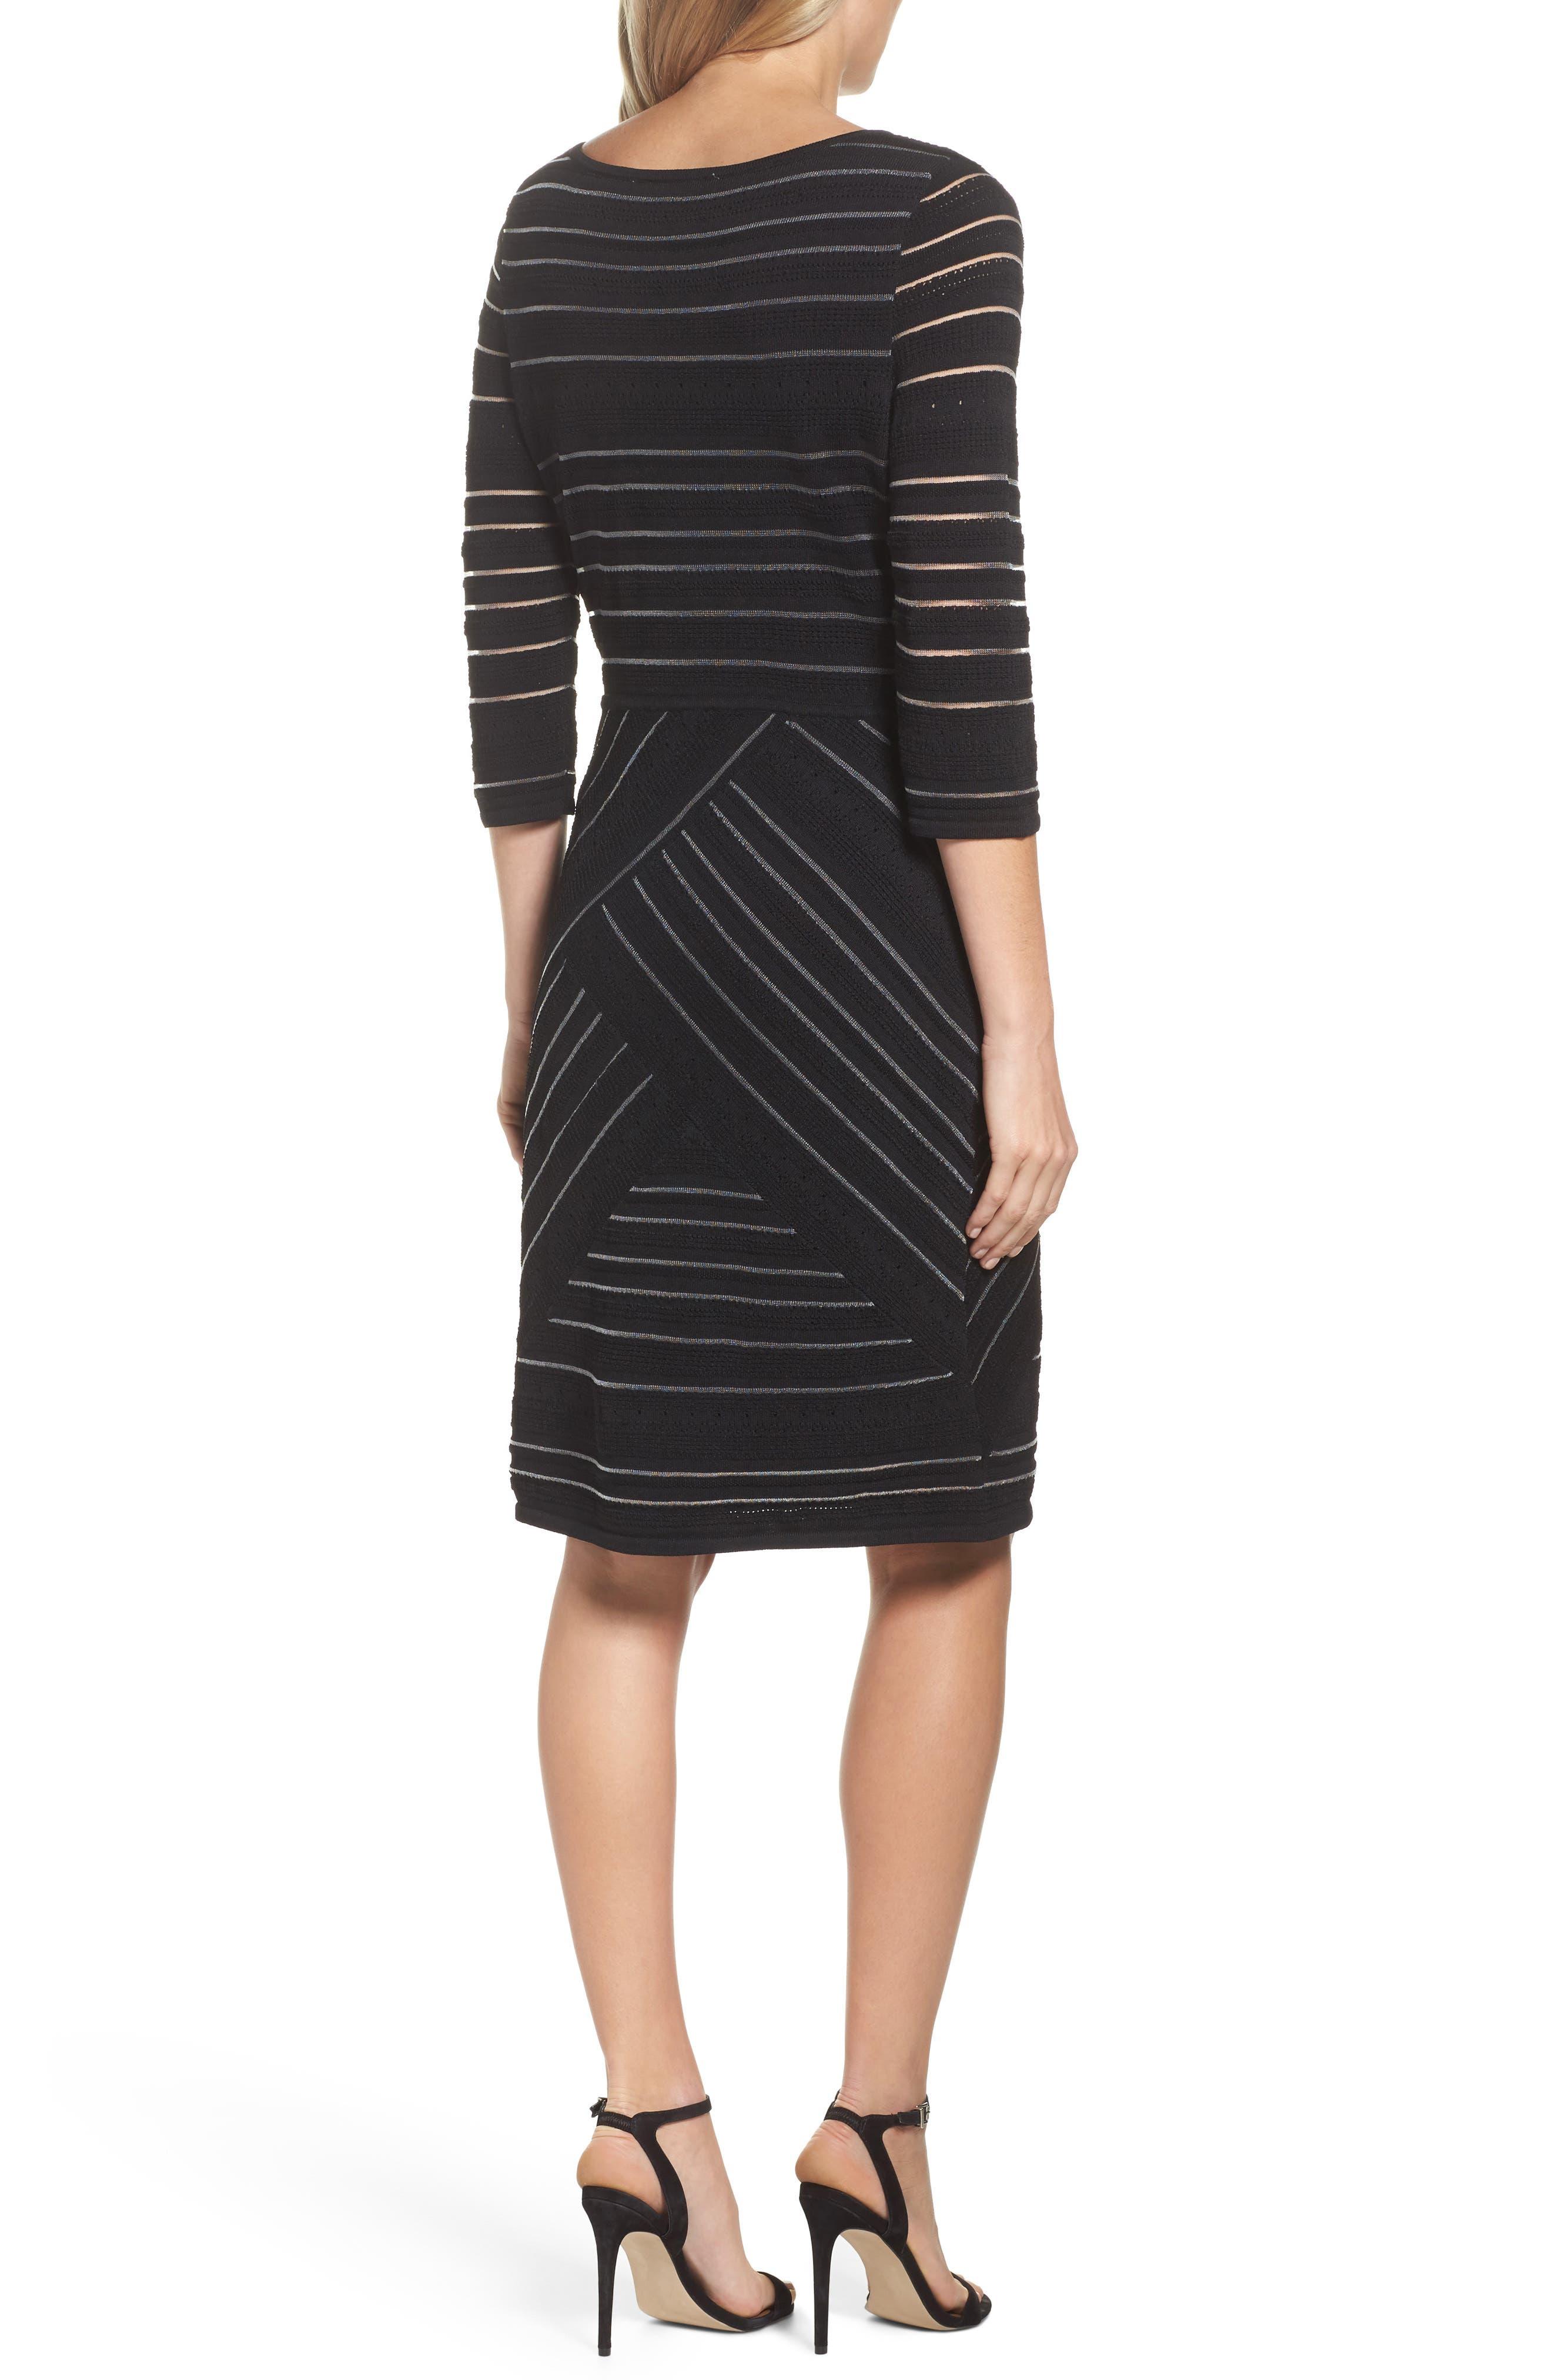 NIC+ ZOE Wrapped Up Sheath Dress,                             Alternate thumbnail 2, color,                             Black Onyx